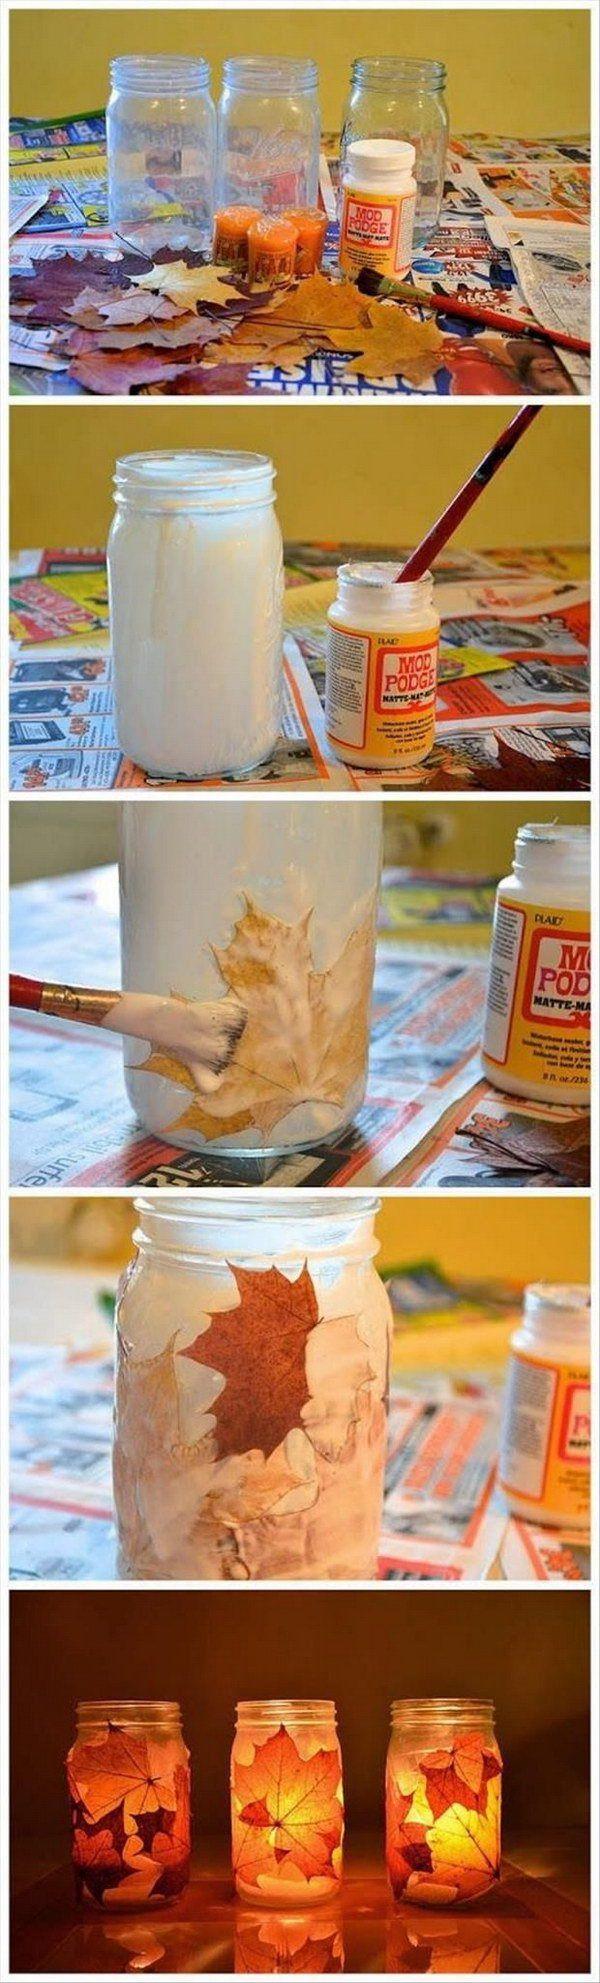 40 Creative DIY Mason Jar Projects with